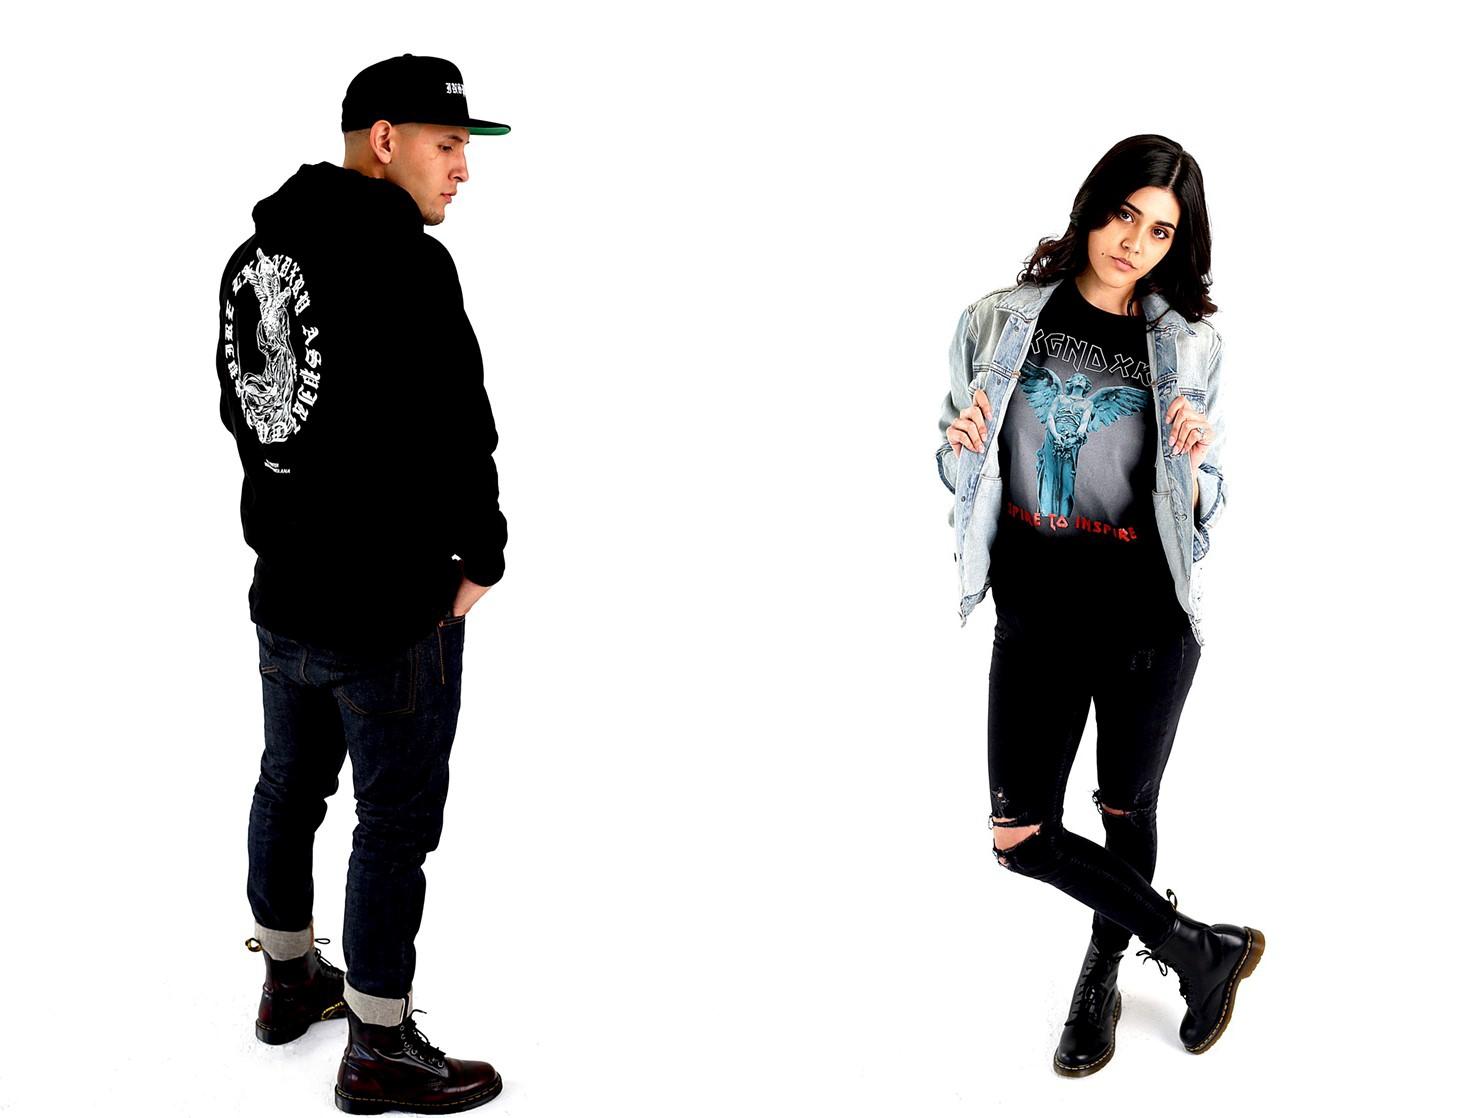 guy and girl posing.jpg